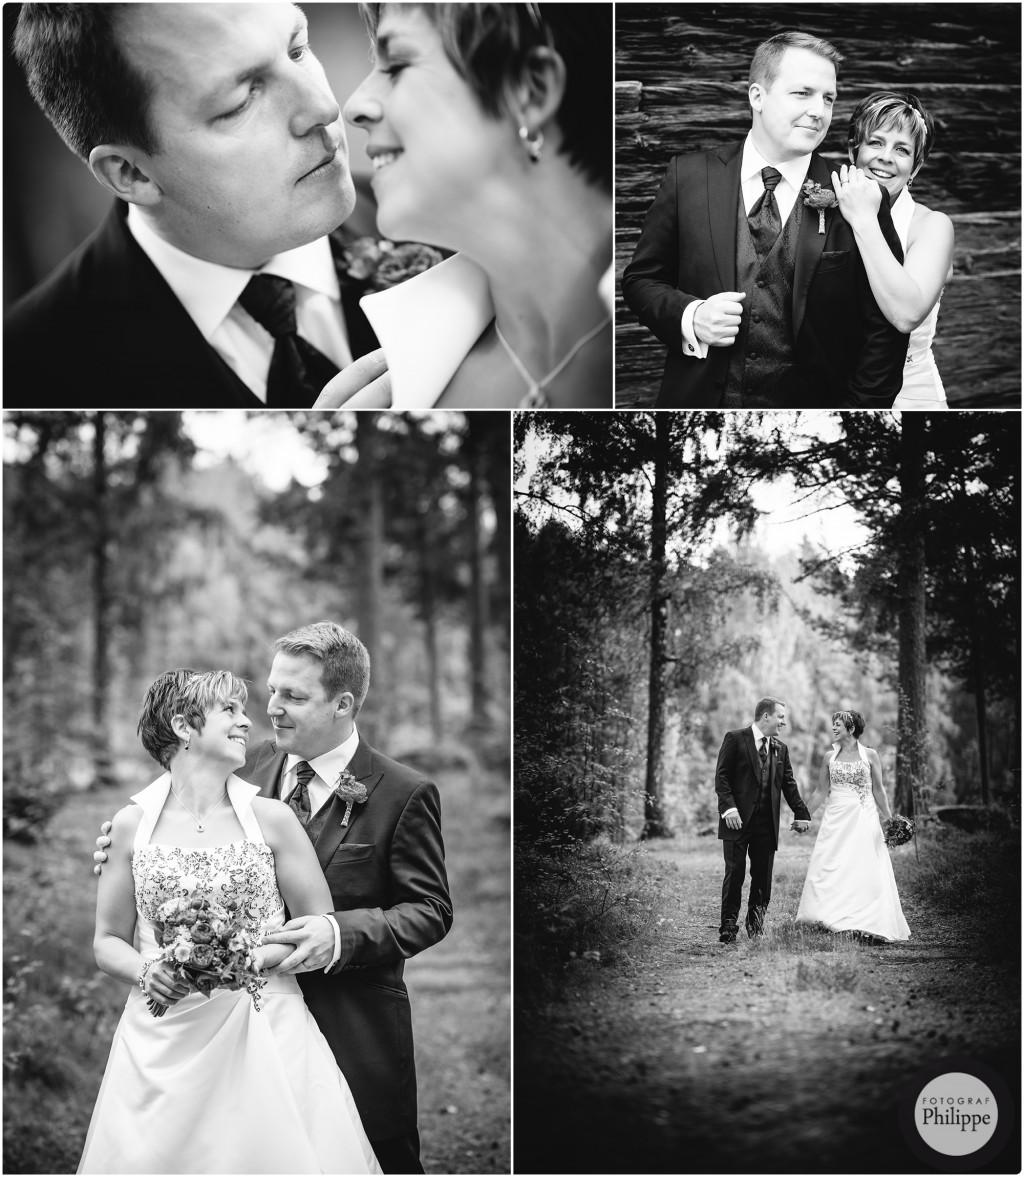 Bröllopsbilder i svartvitt i Järvsö; Åsa & Robert 3